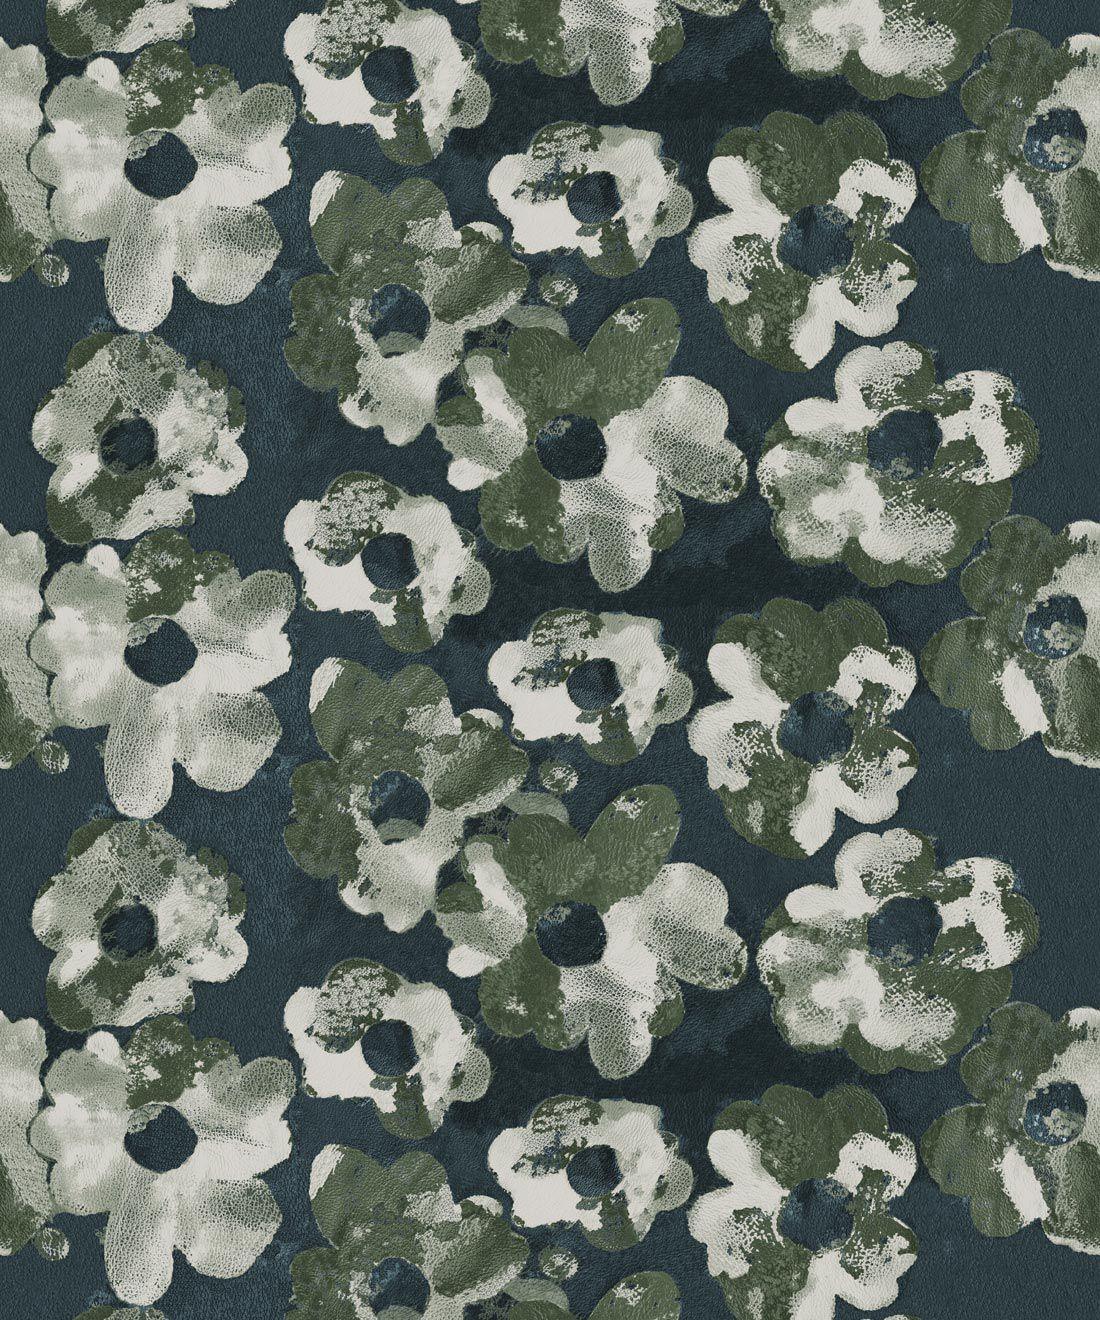 Cherry Blossom Wallpaper Night • Shibori Floral • Night Swatch